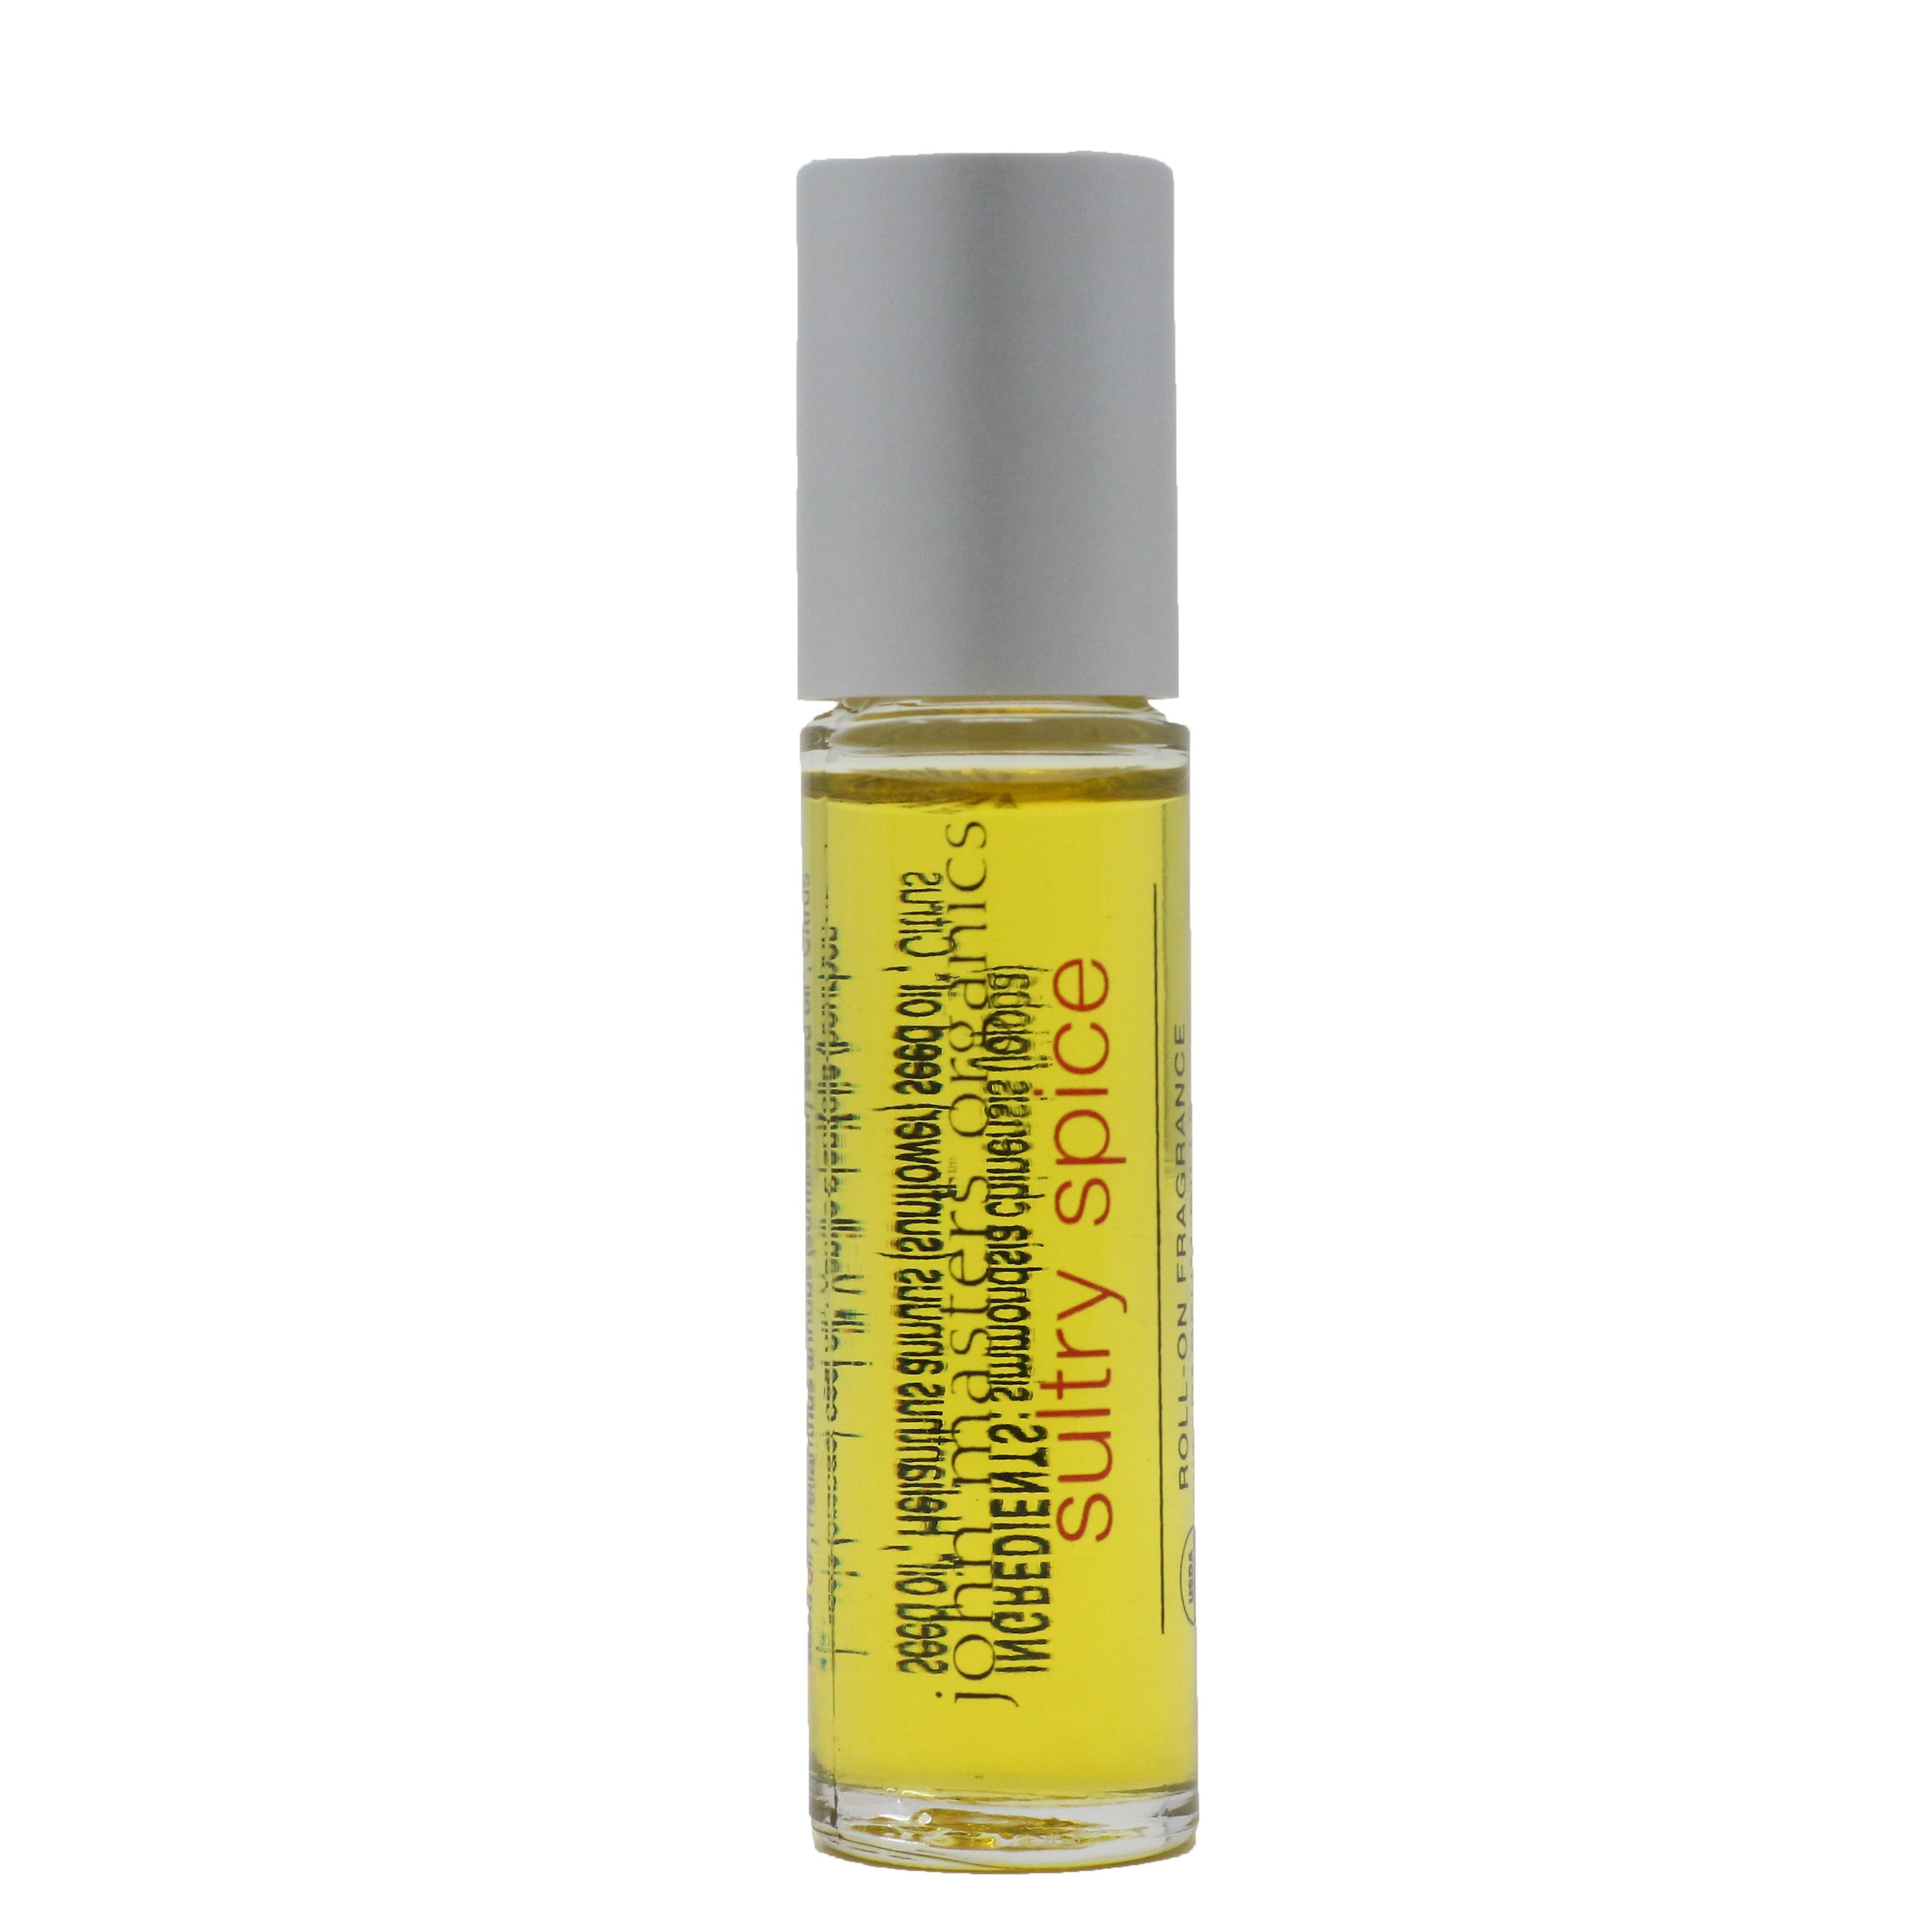 Box John In Spice' Roll on 9ml 3oz Masters Fragrance 'sultry 0 New Organics 1lJFcTK